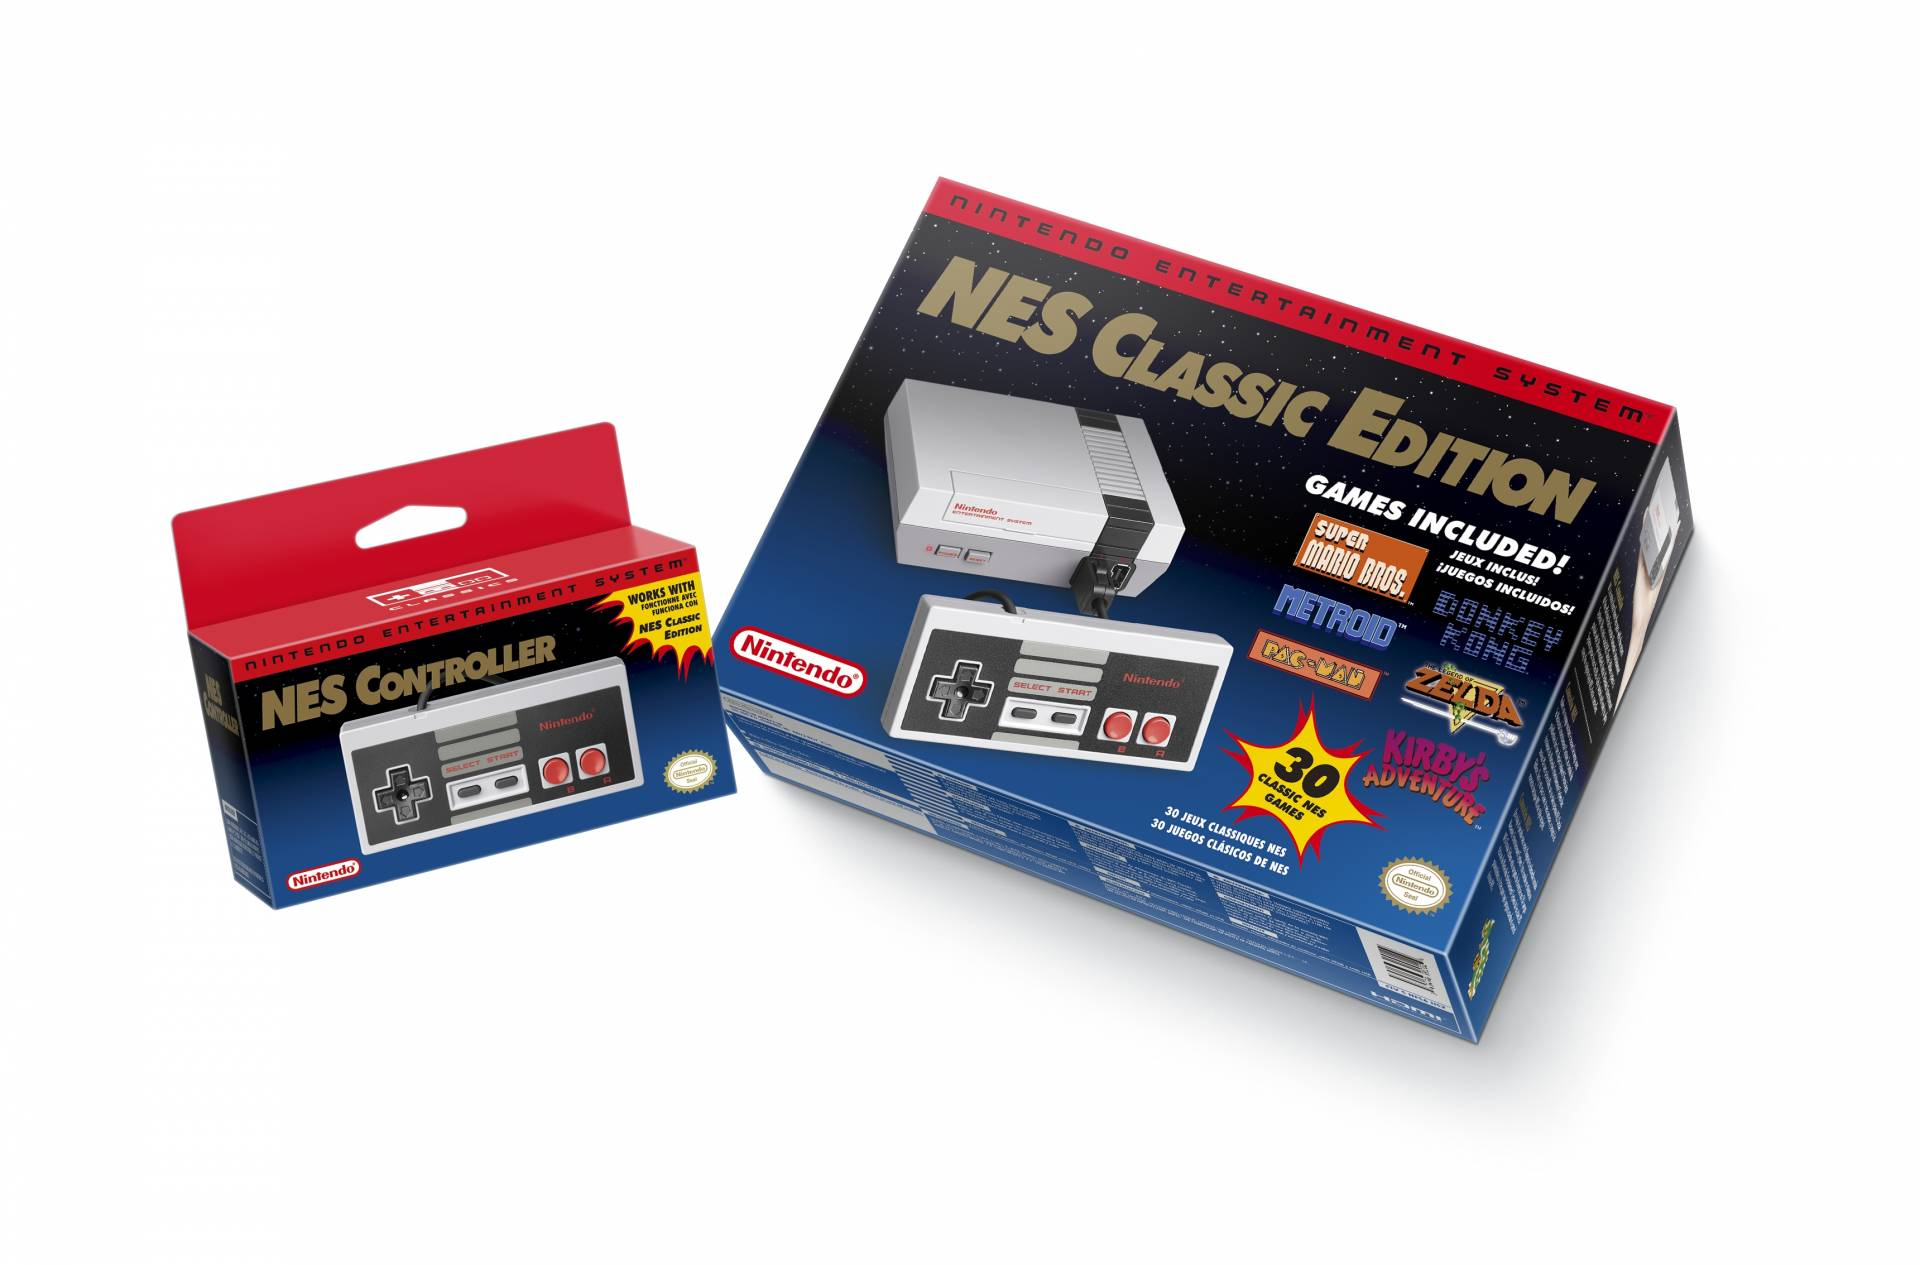 Nintendo's NES Classic Edition.